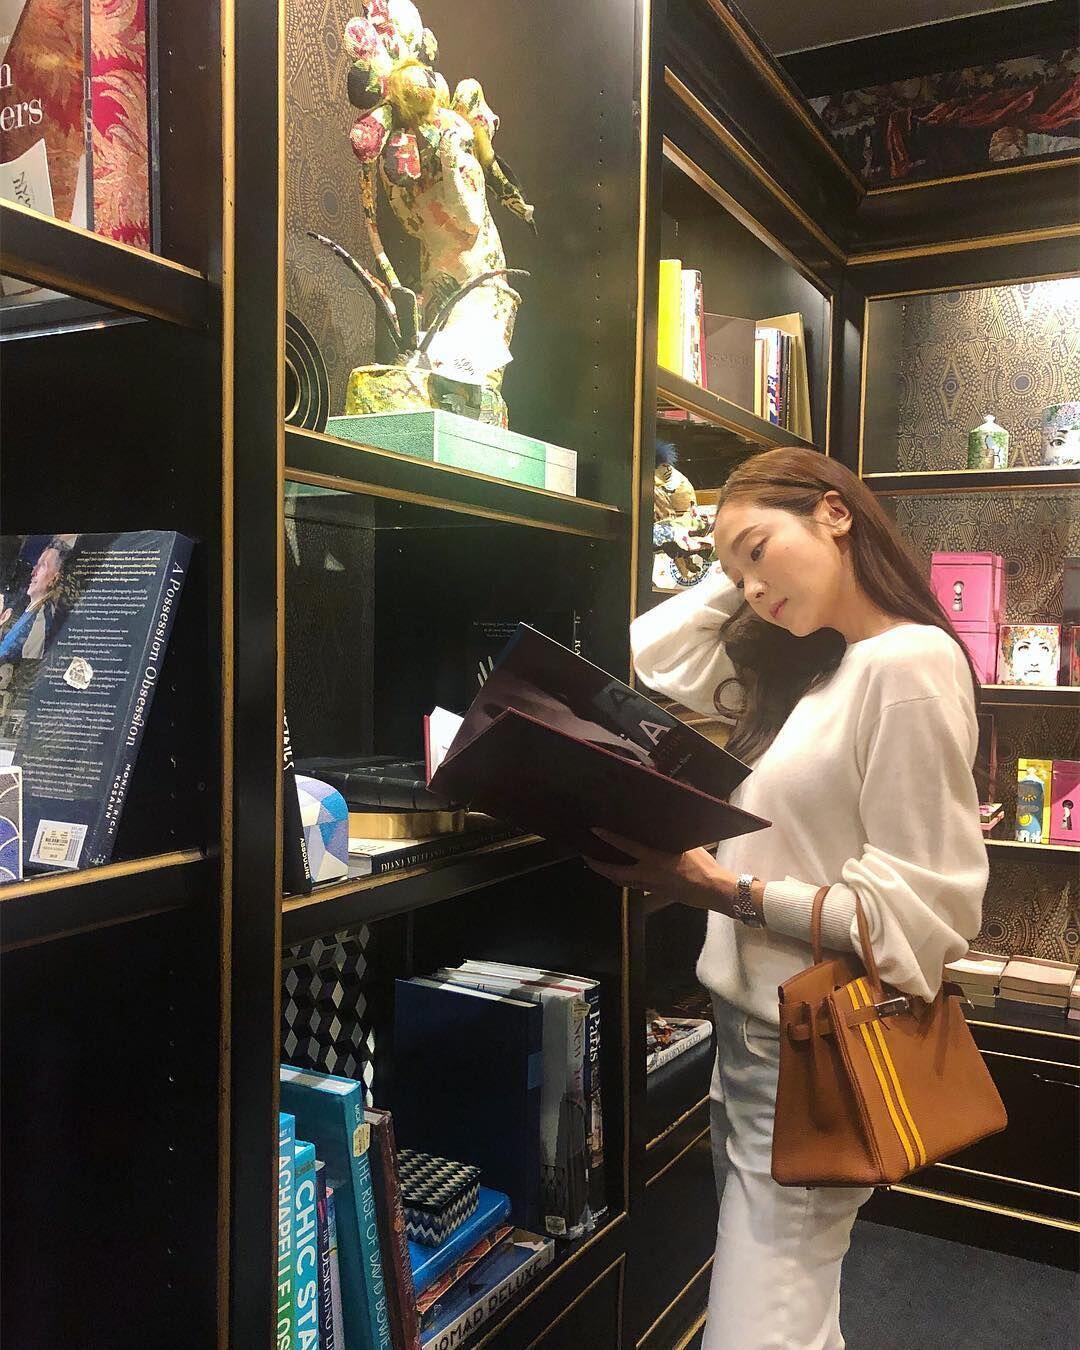 [Eksklusif] 12 Fakta Unik Jessica Jung Tentang Karier Musik & Fashion